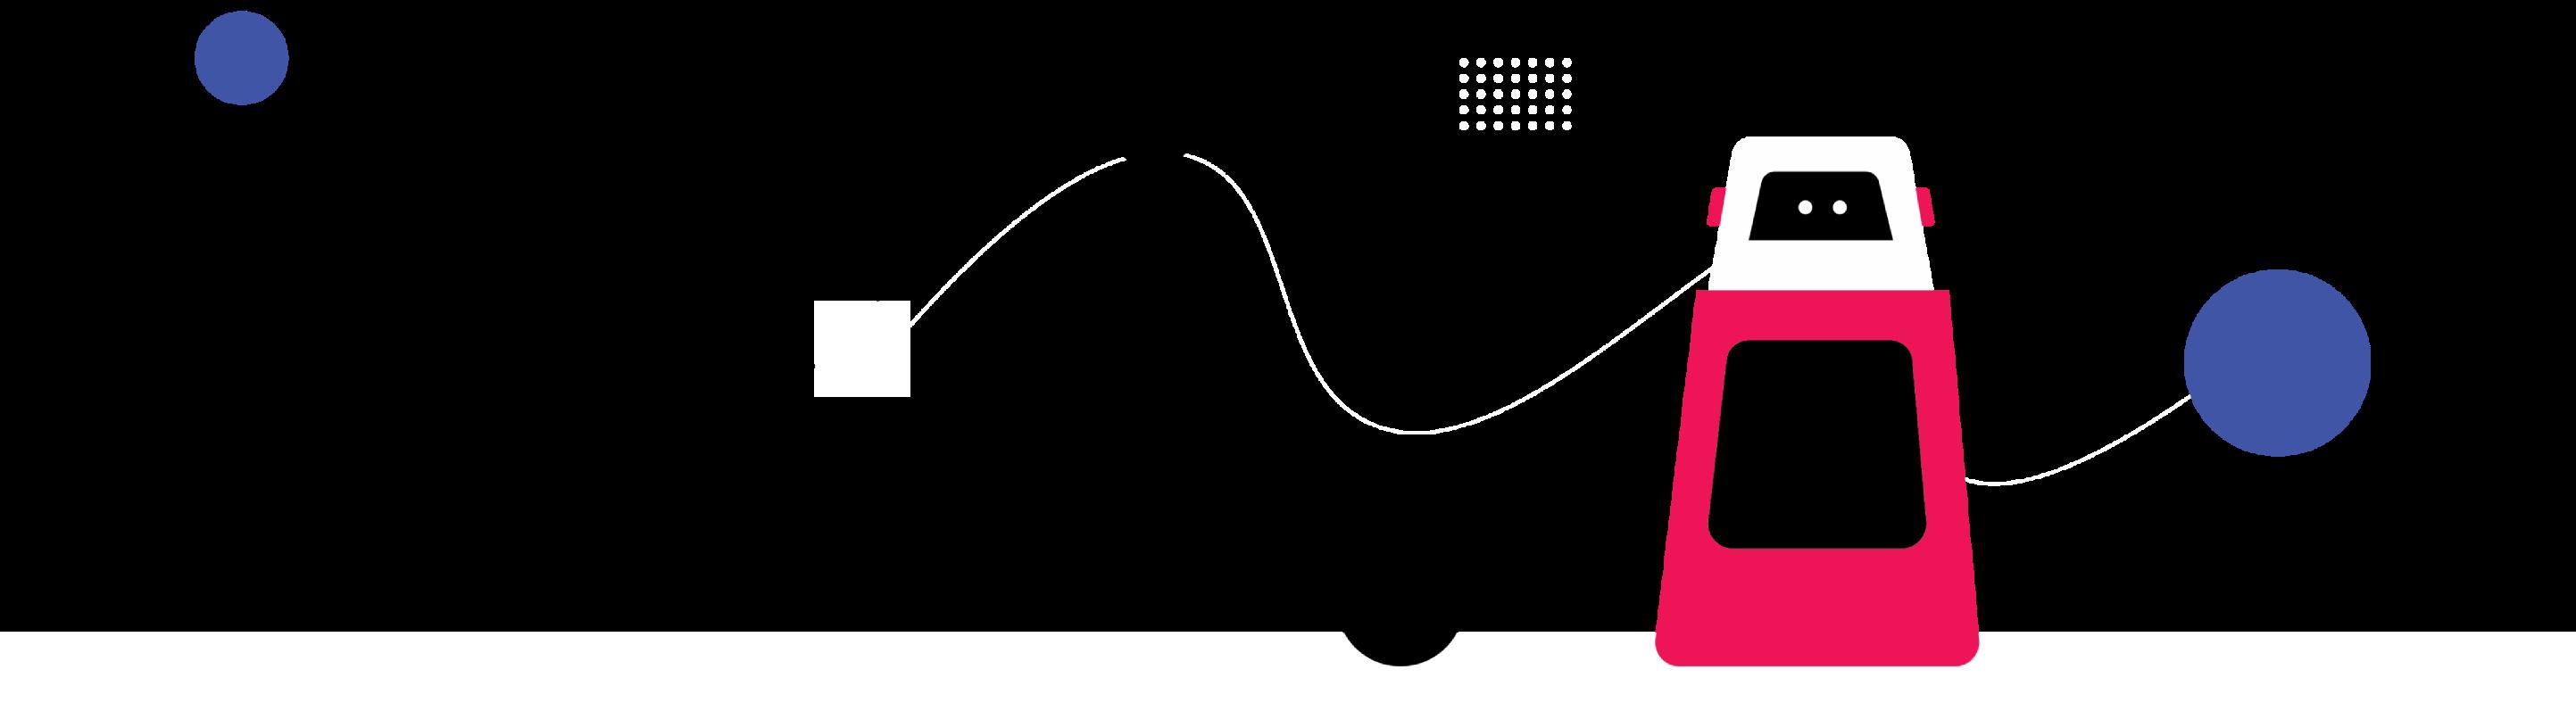 aws-warehouse-illustration